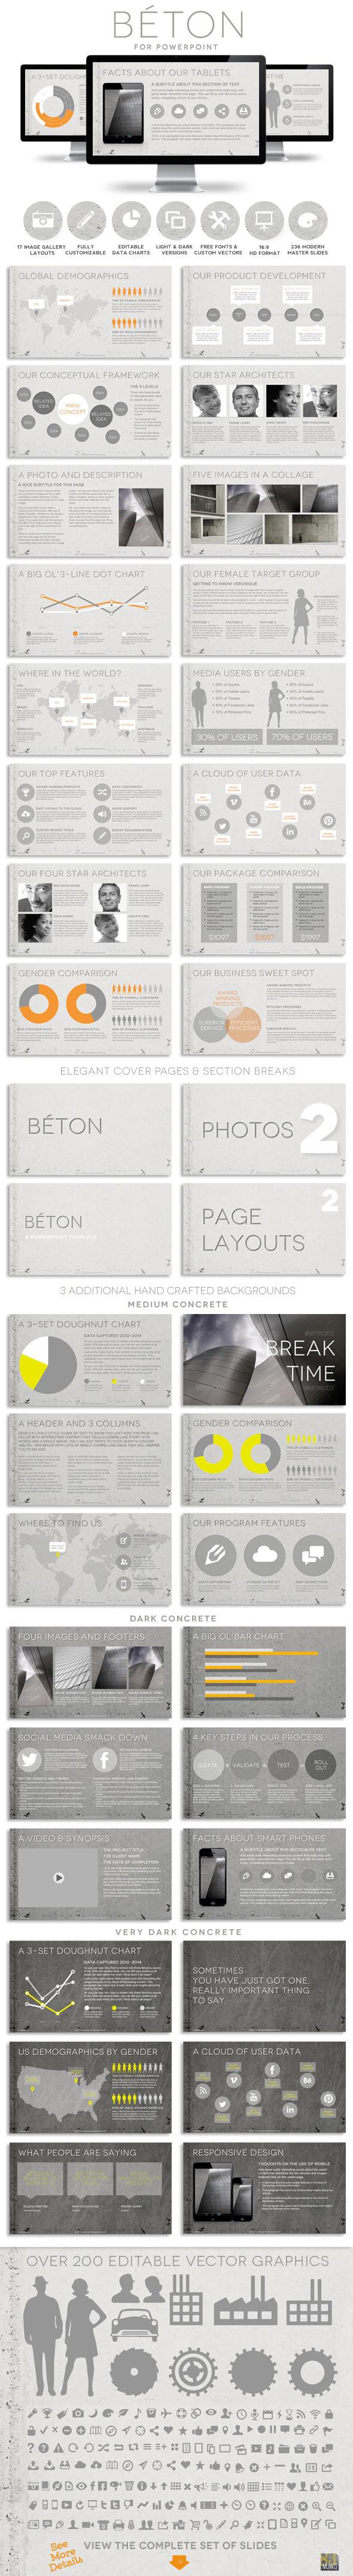 Béton Powerpoint Presentation Template - Creative PowerPoint Templates